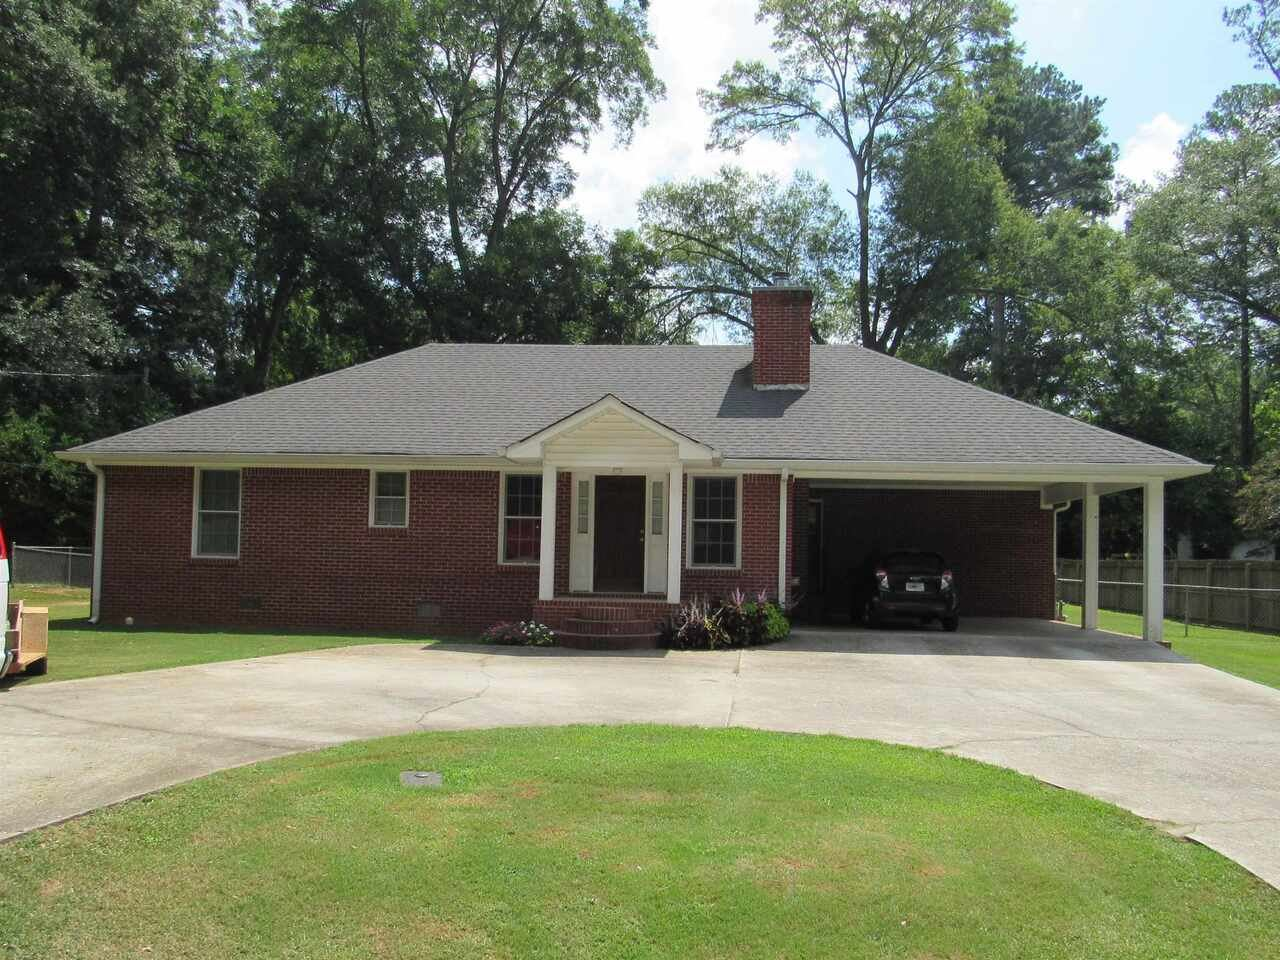 506 S West Street, Greensboro, GA 30642 - MLS#: 9042217